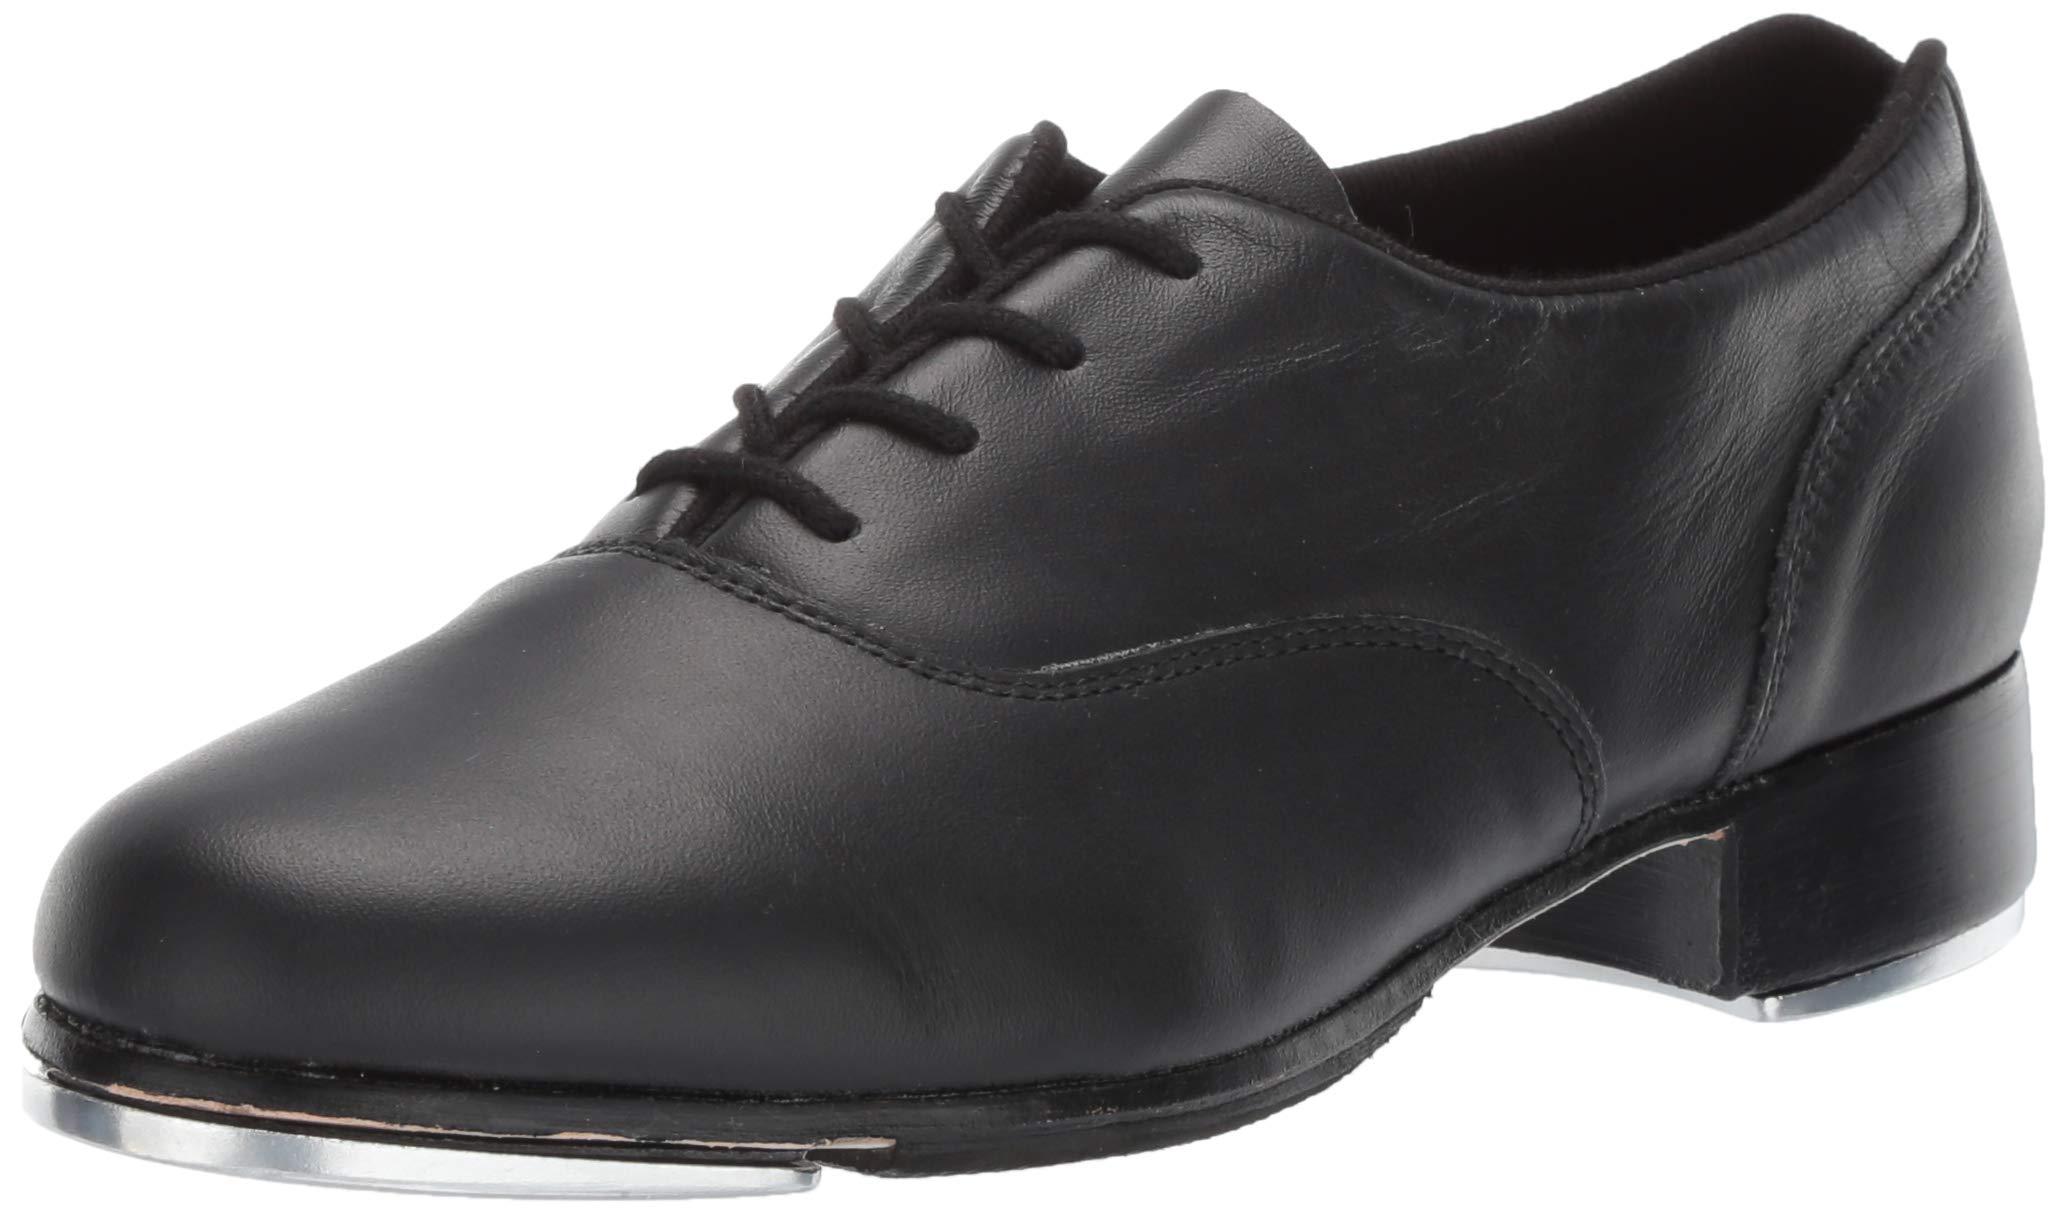 Bloch Women's Respect Dance Shoe, Black, 9 Medium US by Bloch